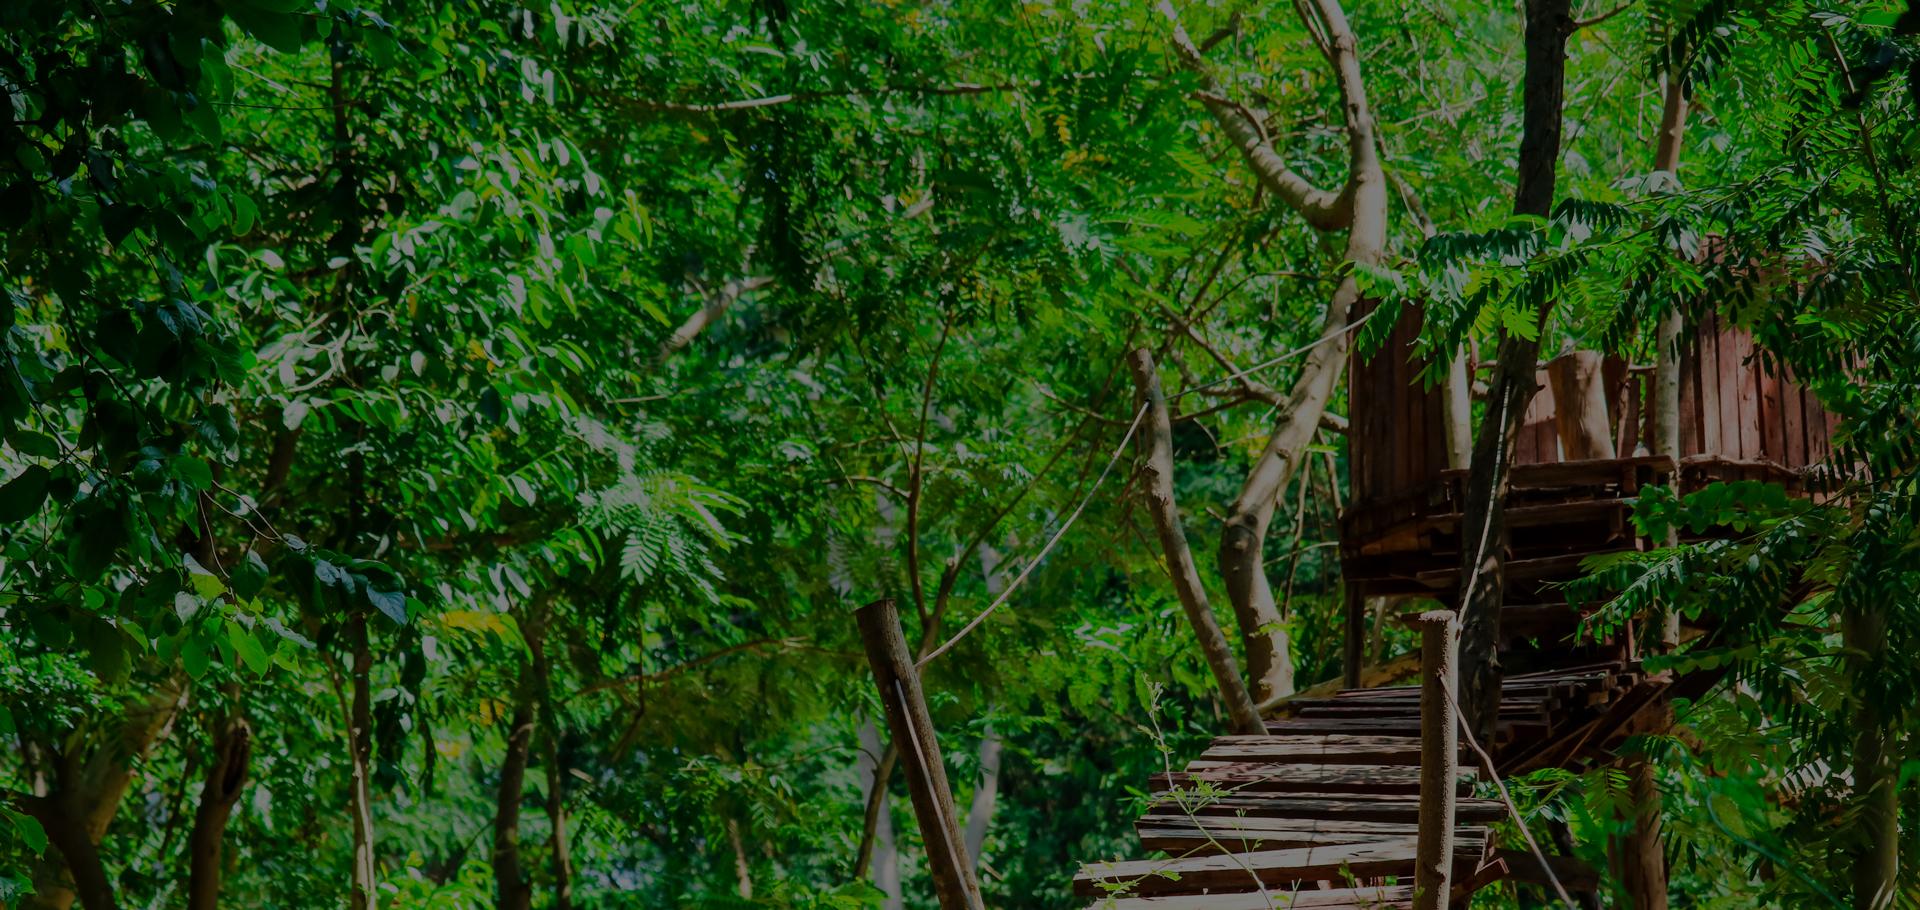 Greenrod construit vos cabanes dans les arbres